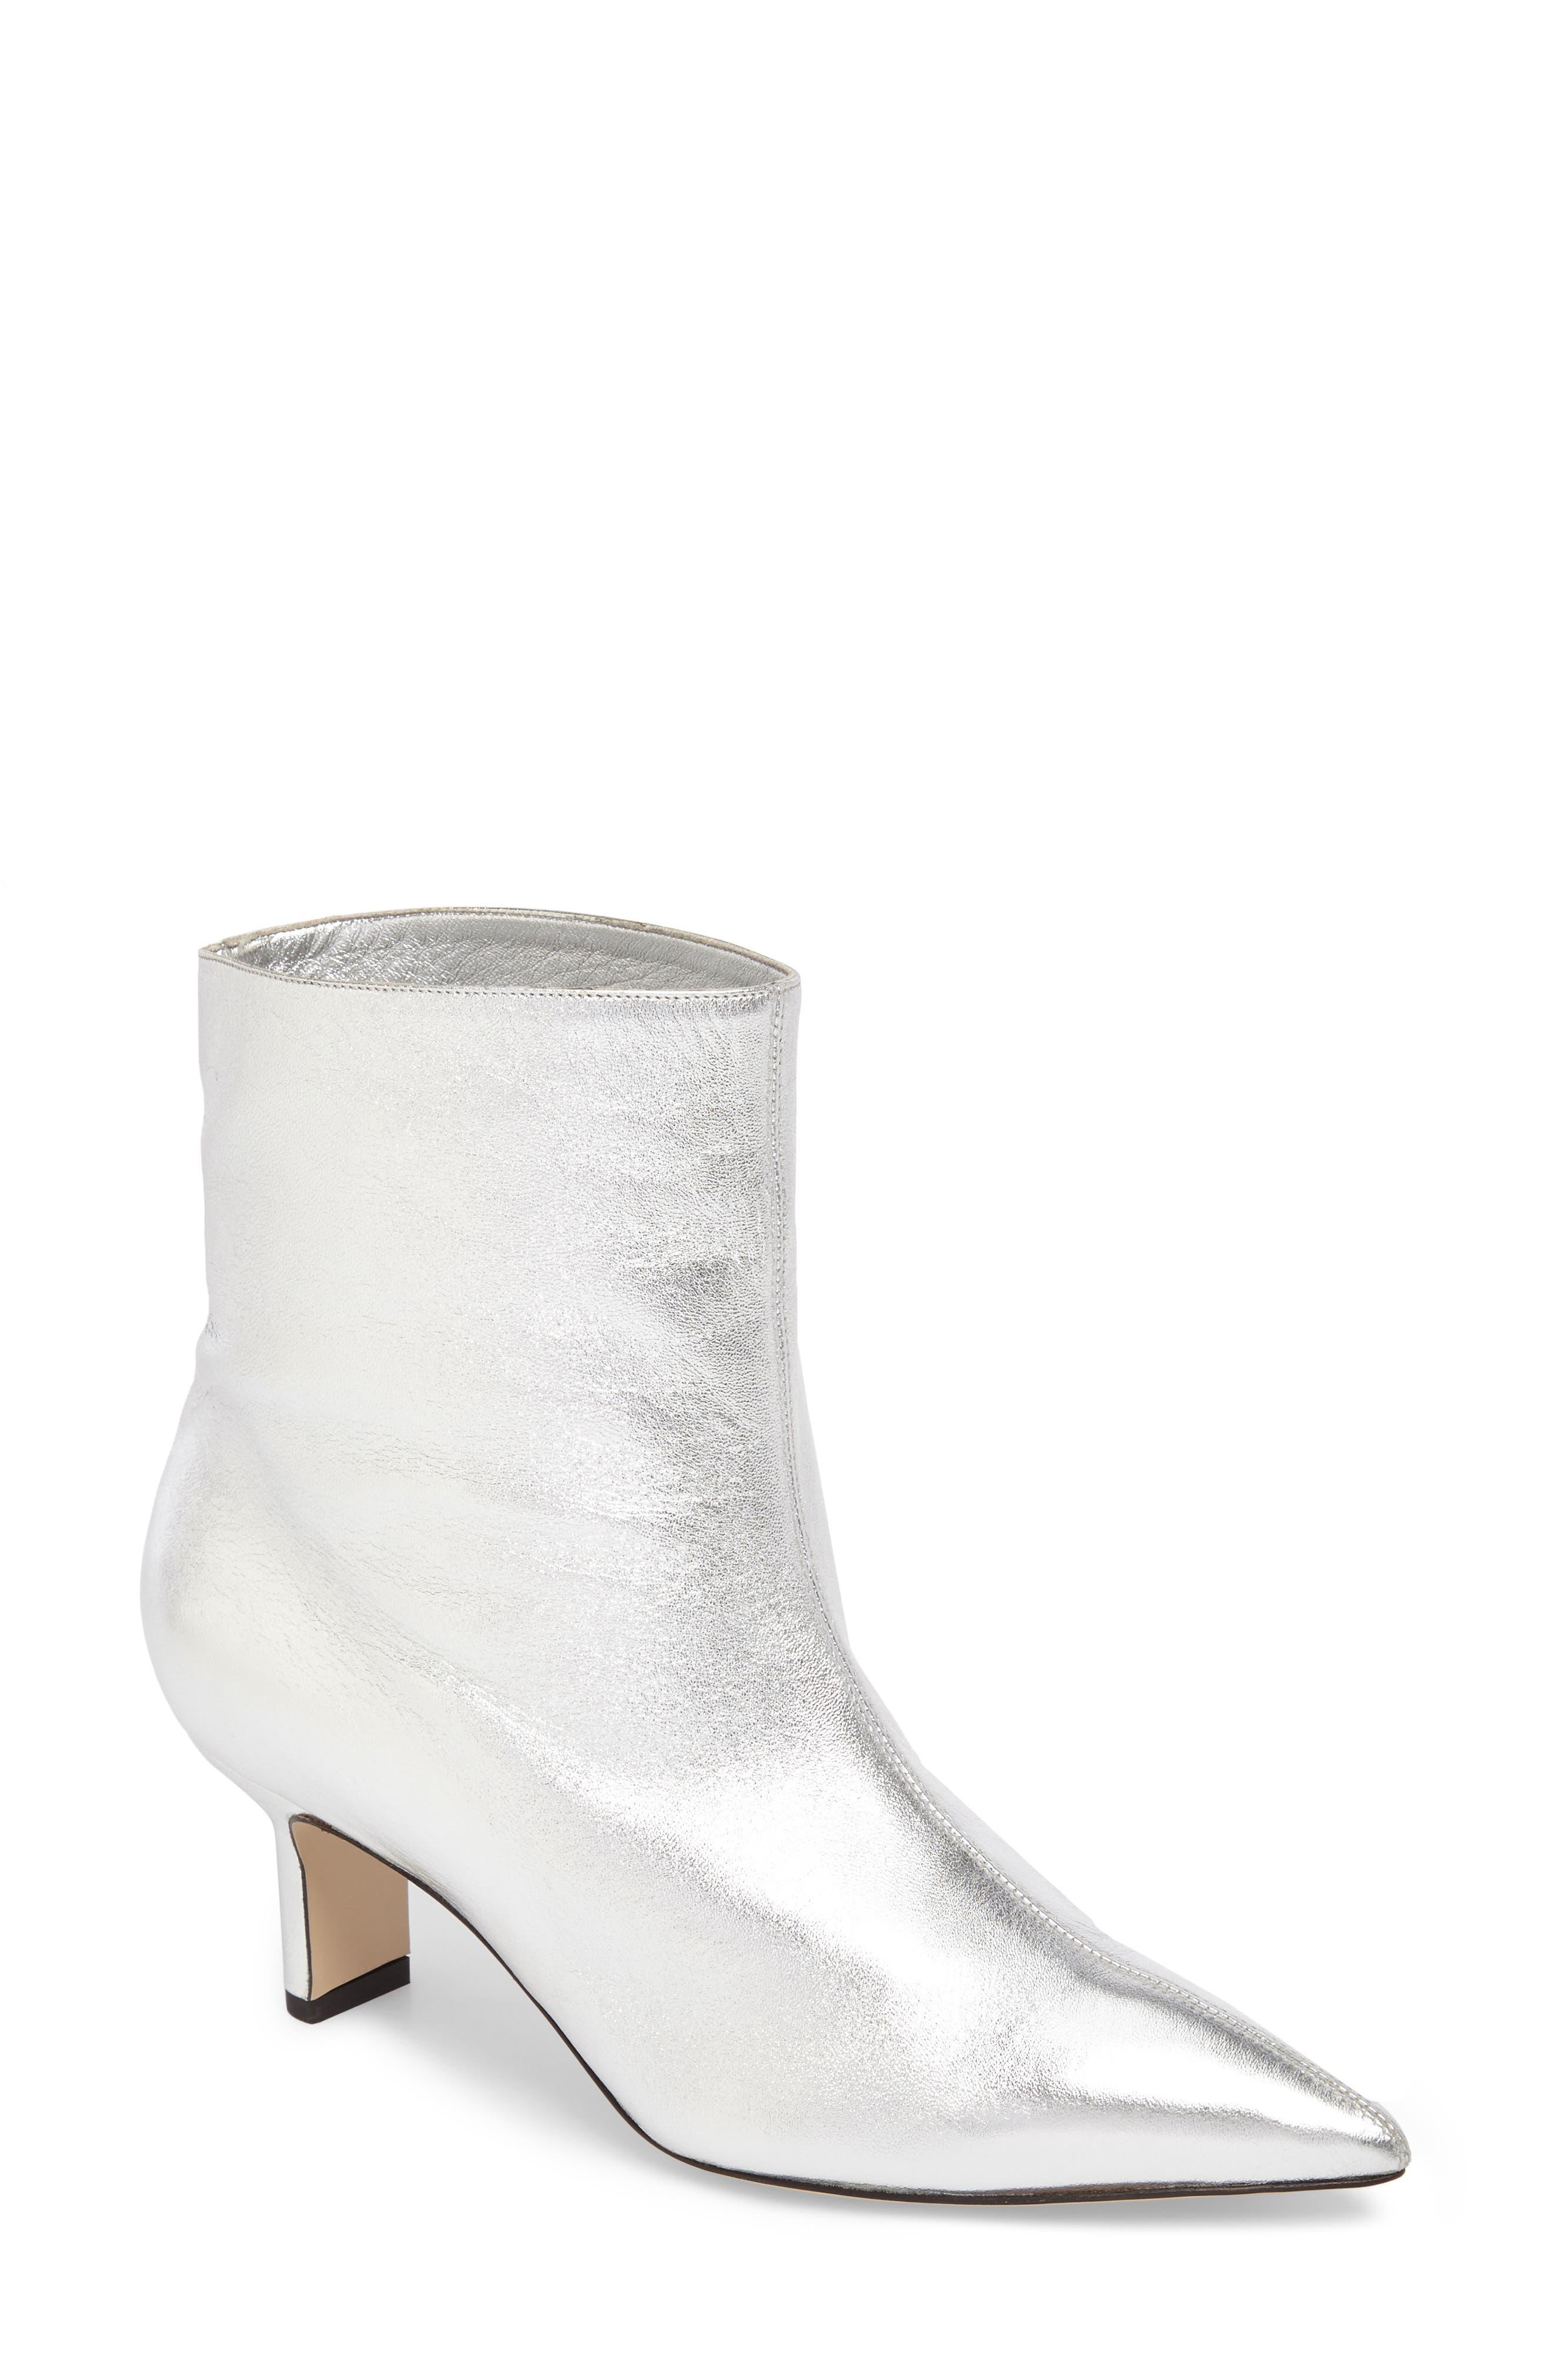 Mangold Pointy Toe Boot,                             Main thumbnail 1, color,                             Silver